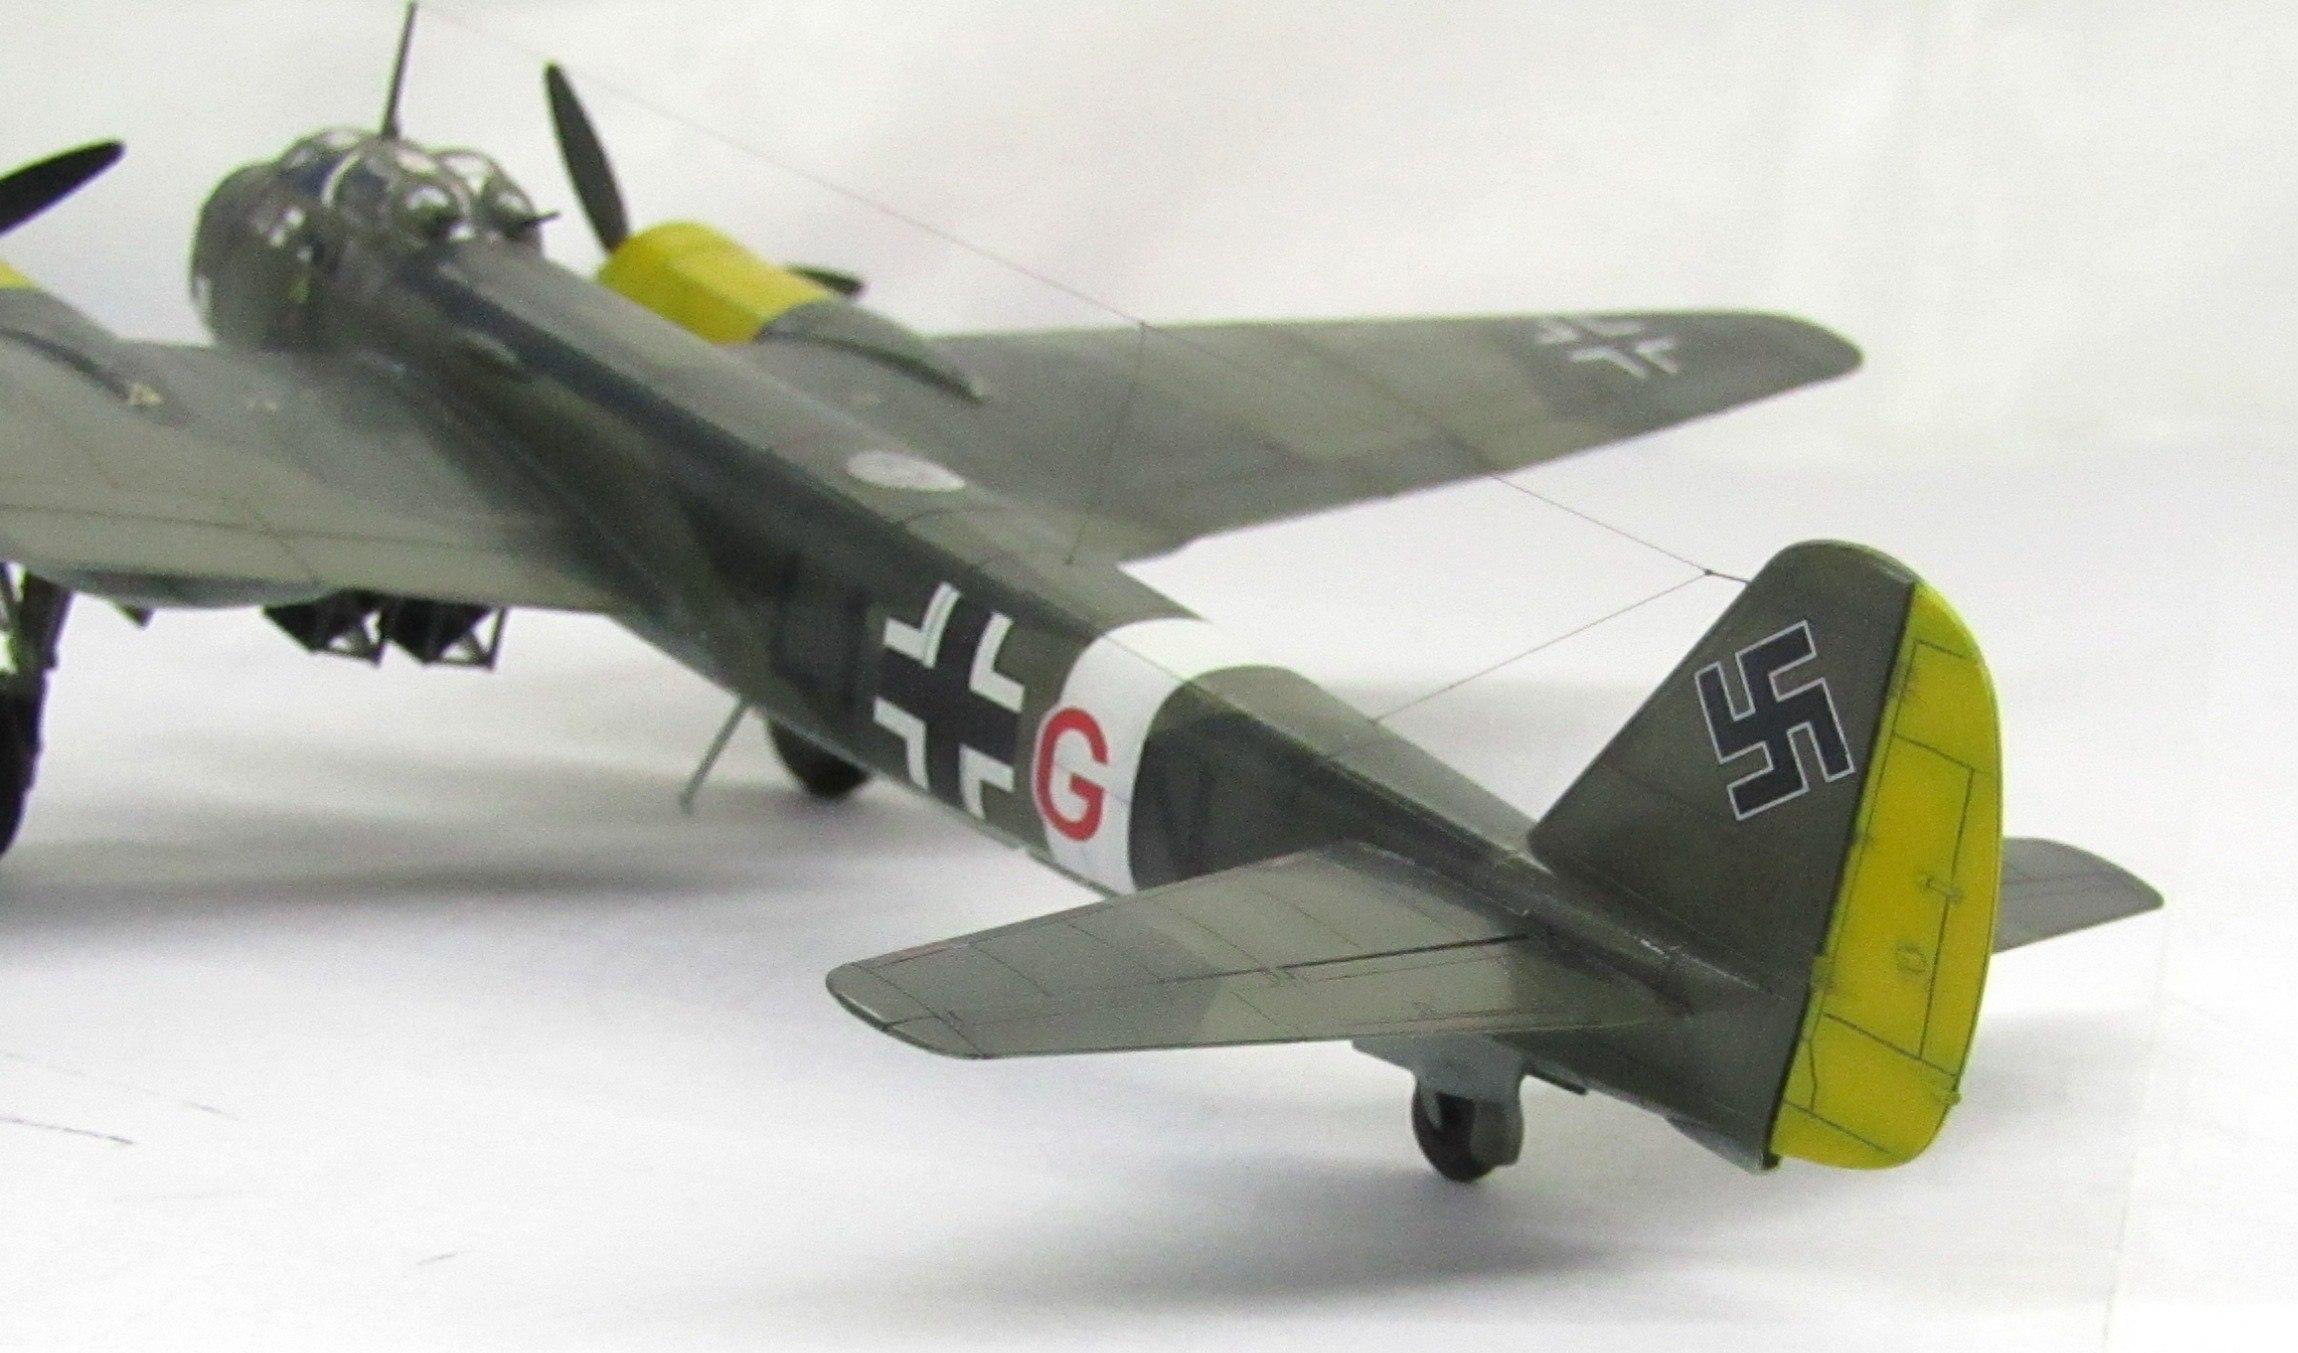 Ju-88 A-4 1/72 (Звезда) 6s4YGbjCkbk